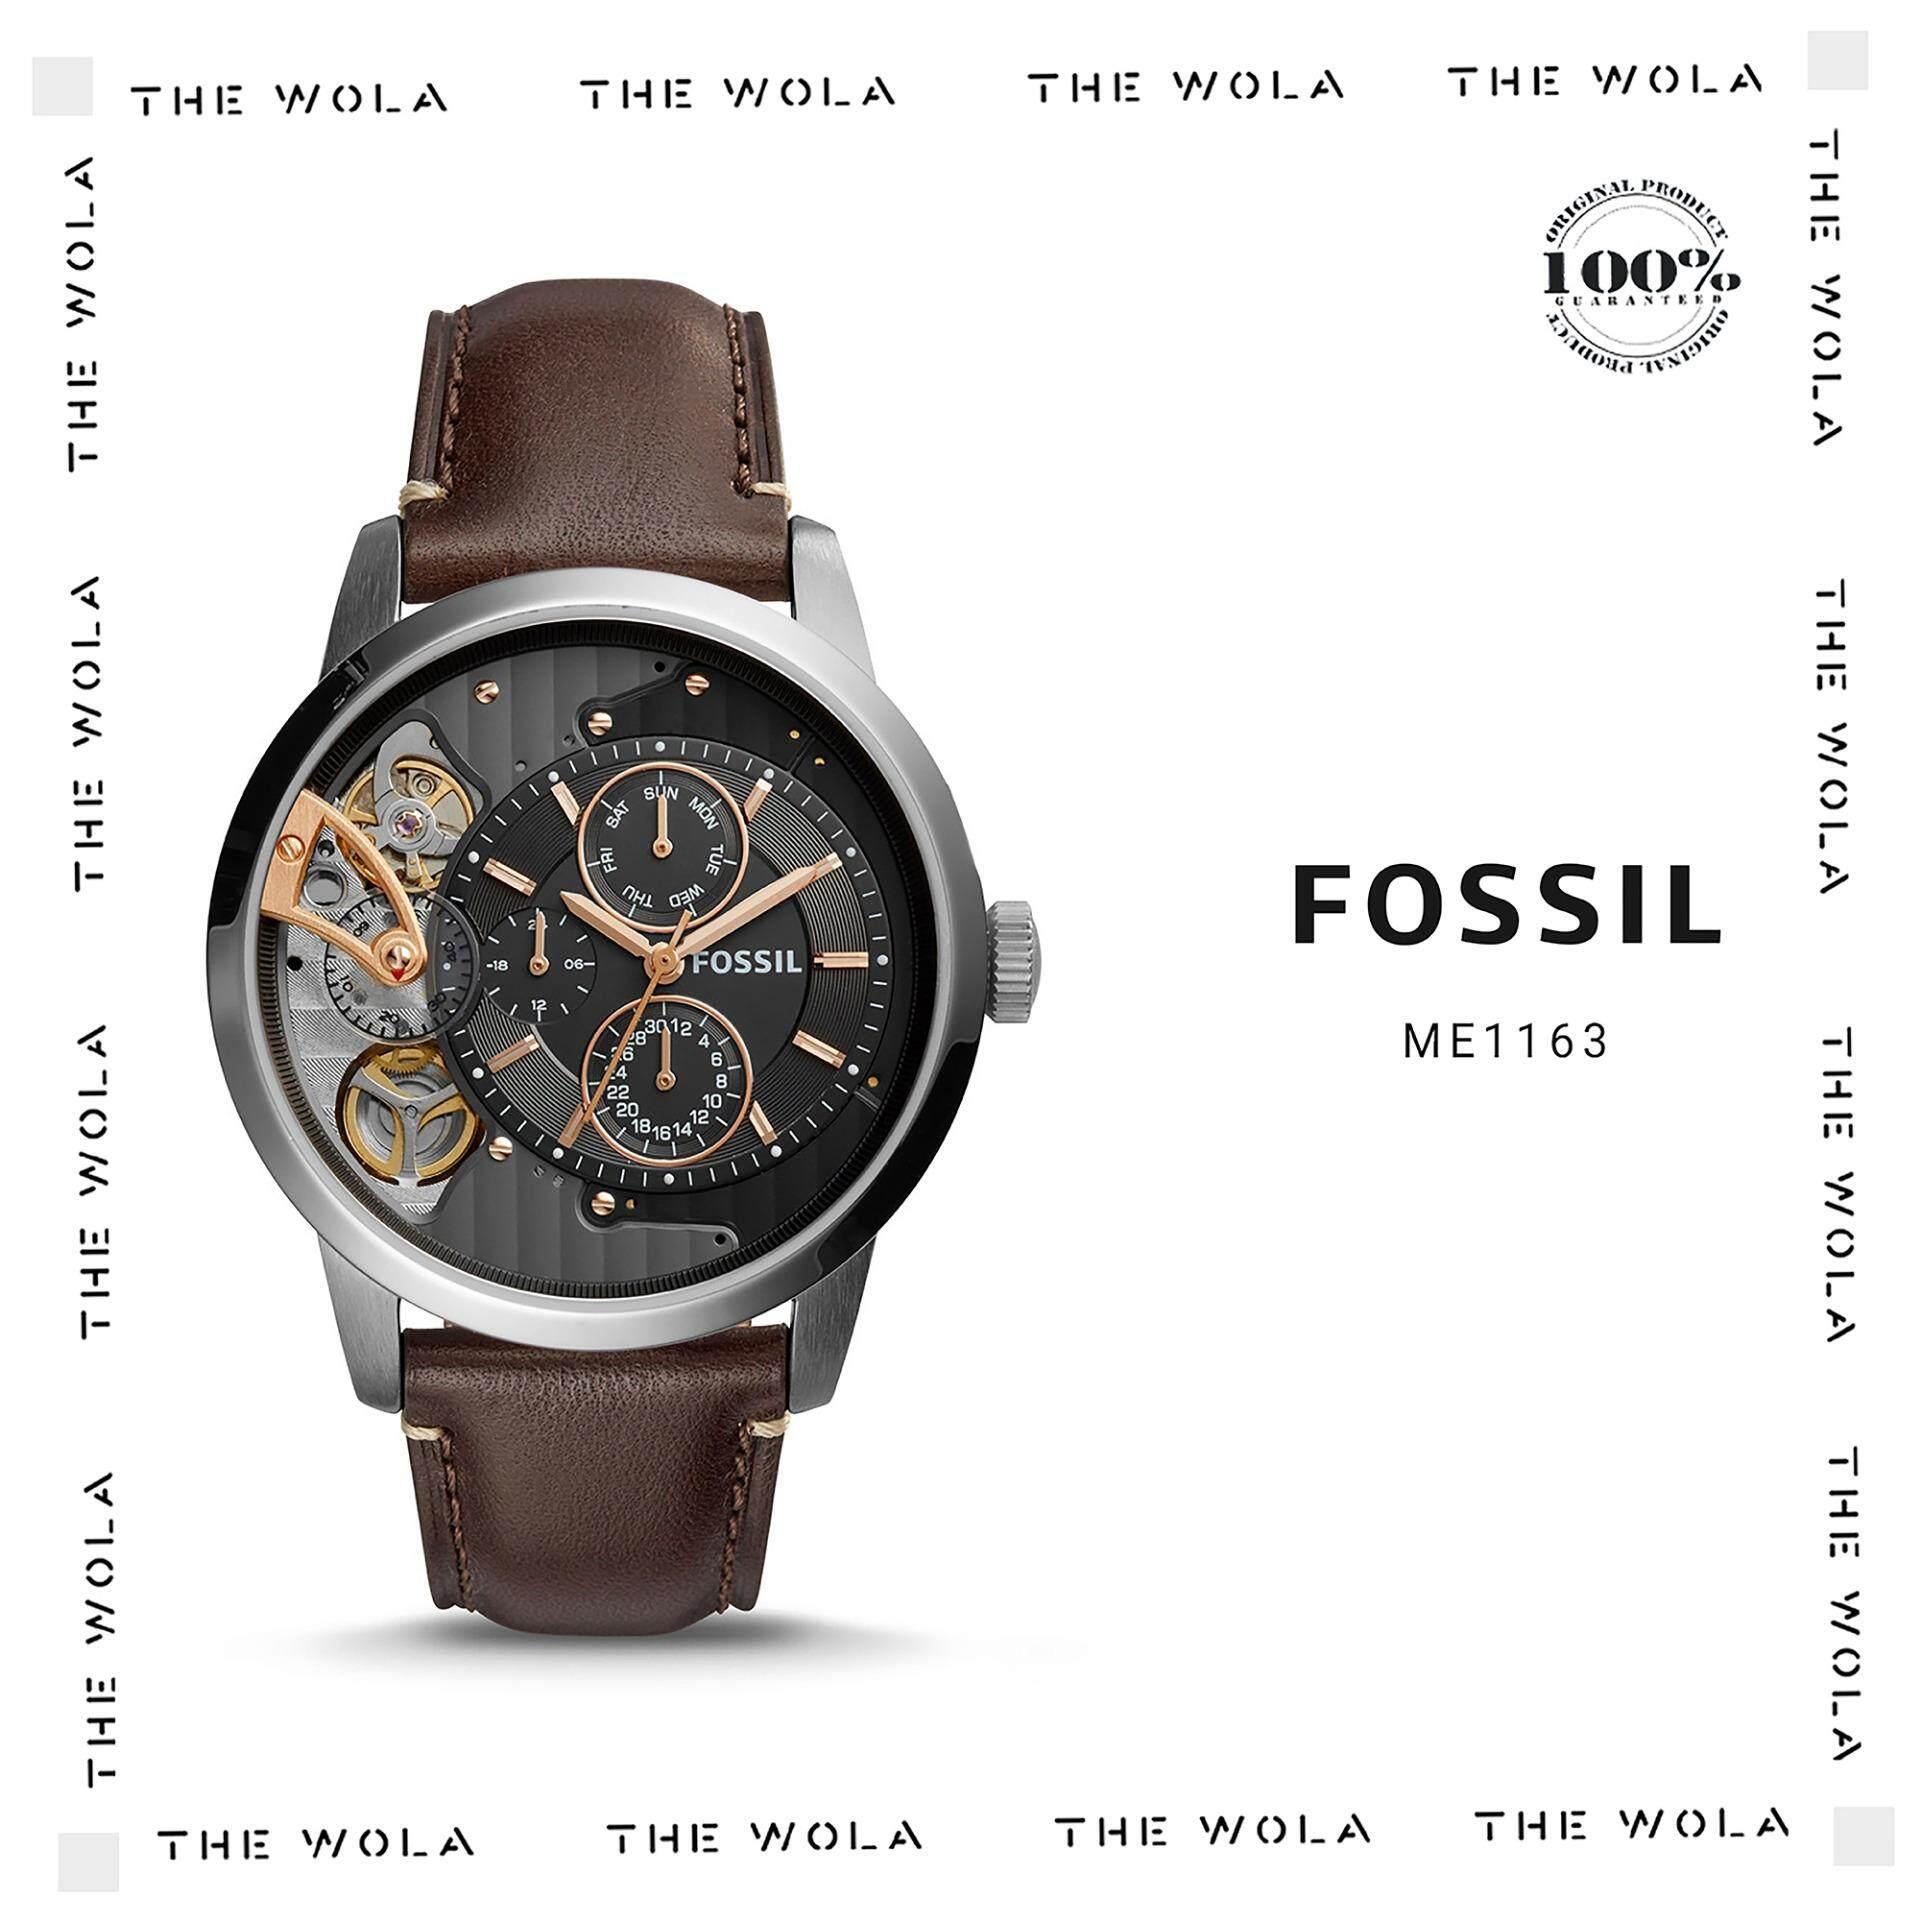 FOSSIL AUTOMATIC MEN WATCH ME1163 Original & Genuine (2 Years Warranty)